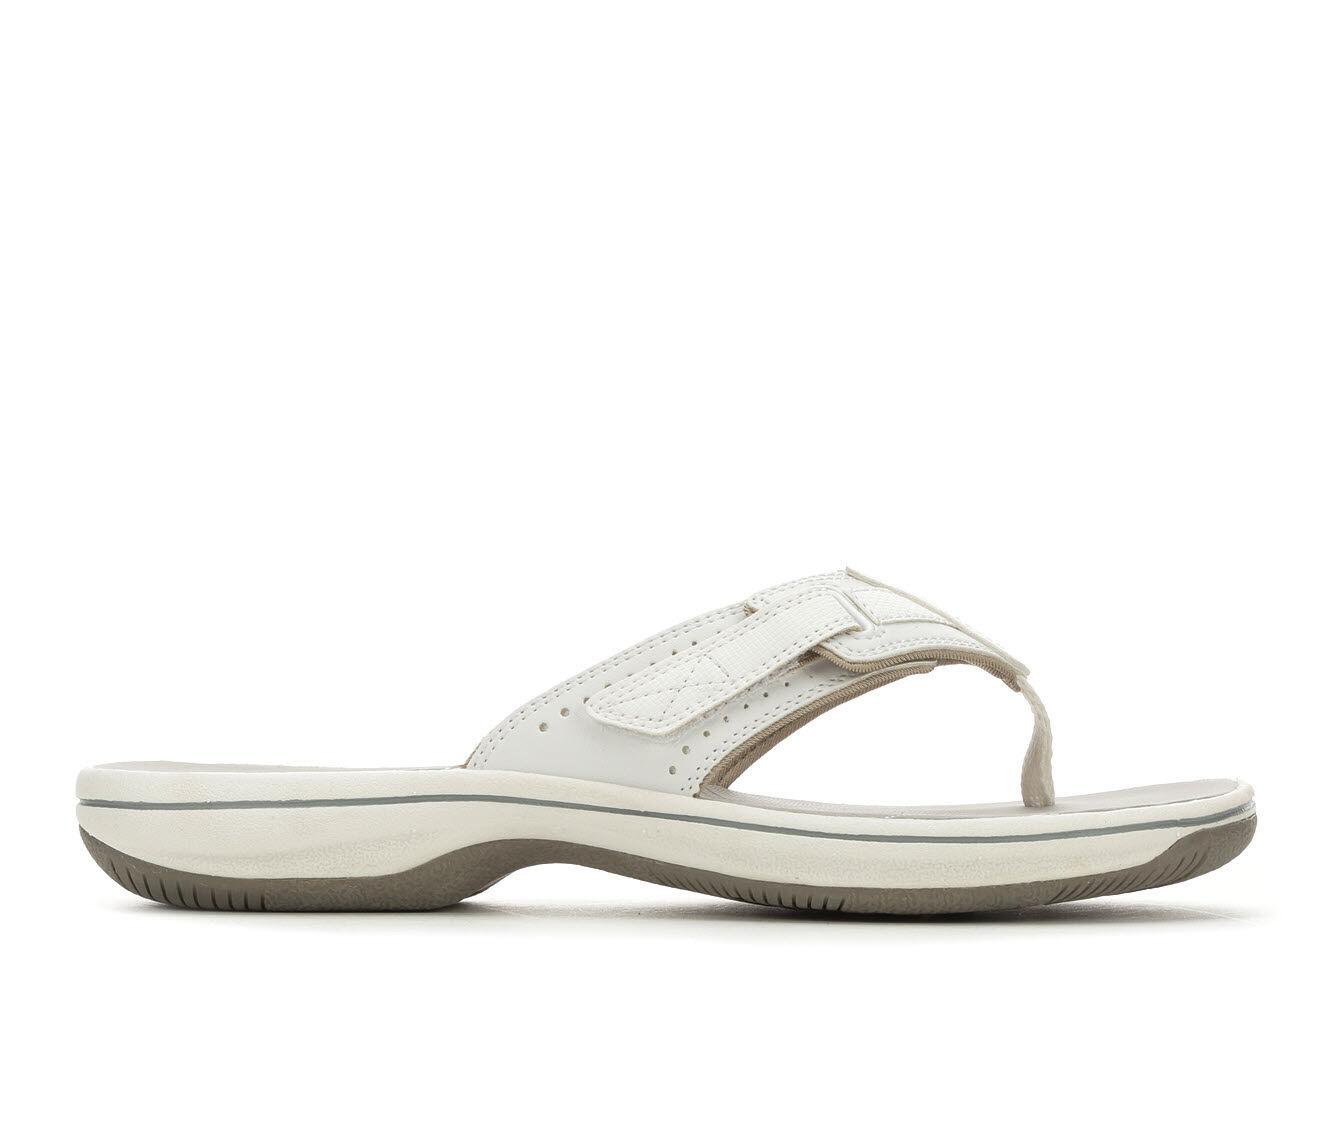 Women's Clarks Brinkley Reef Sandals White